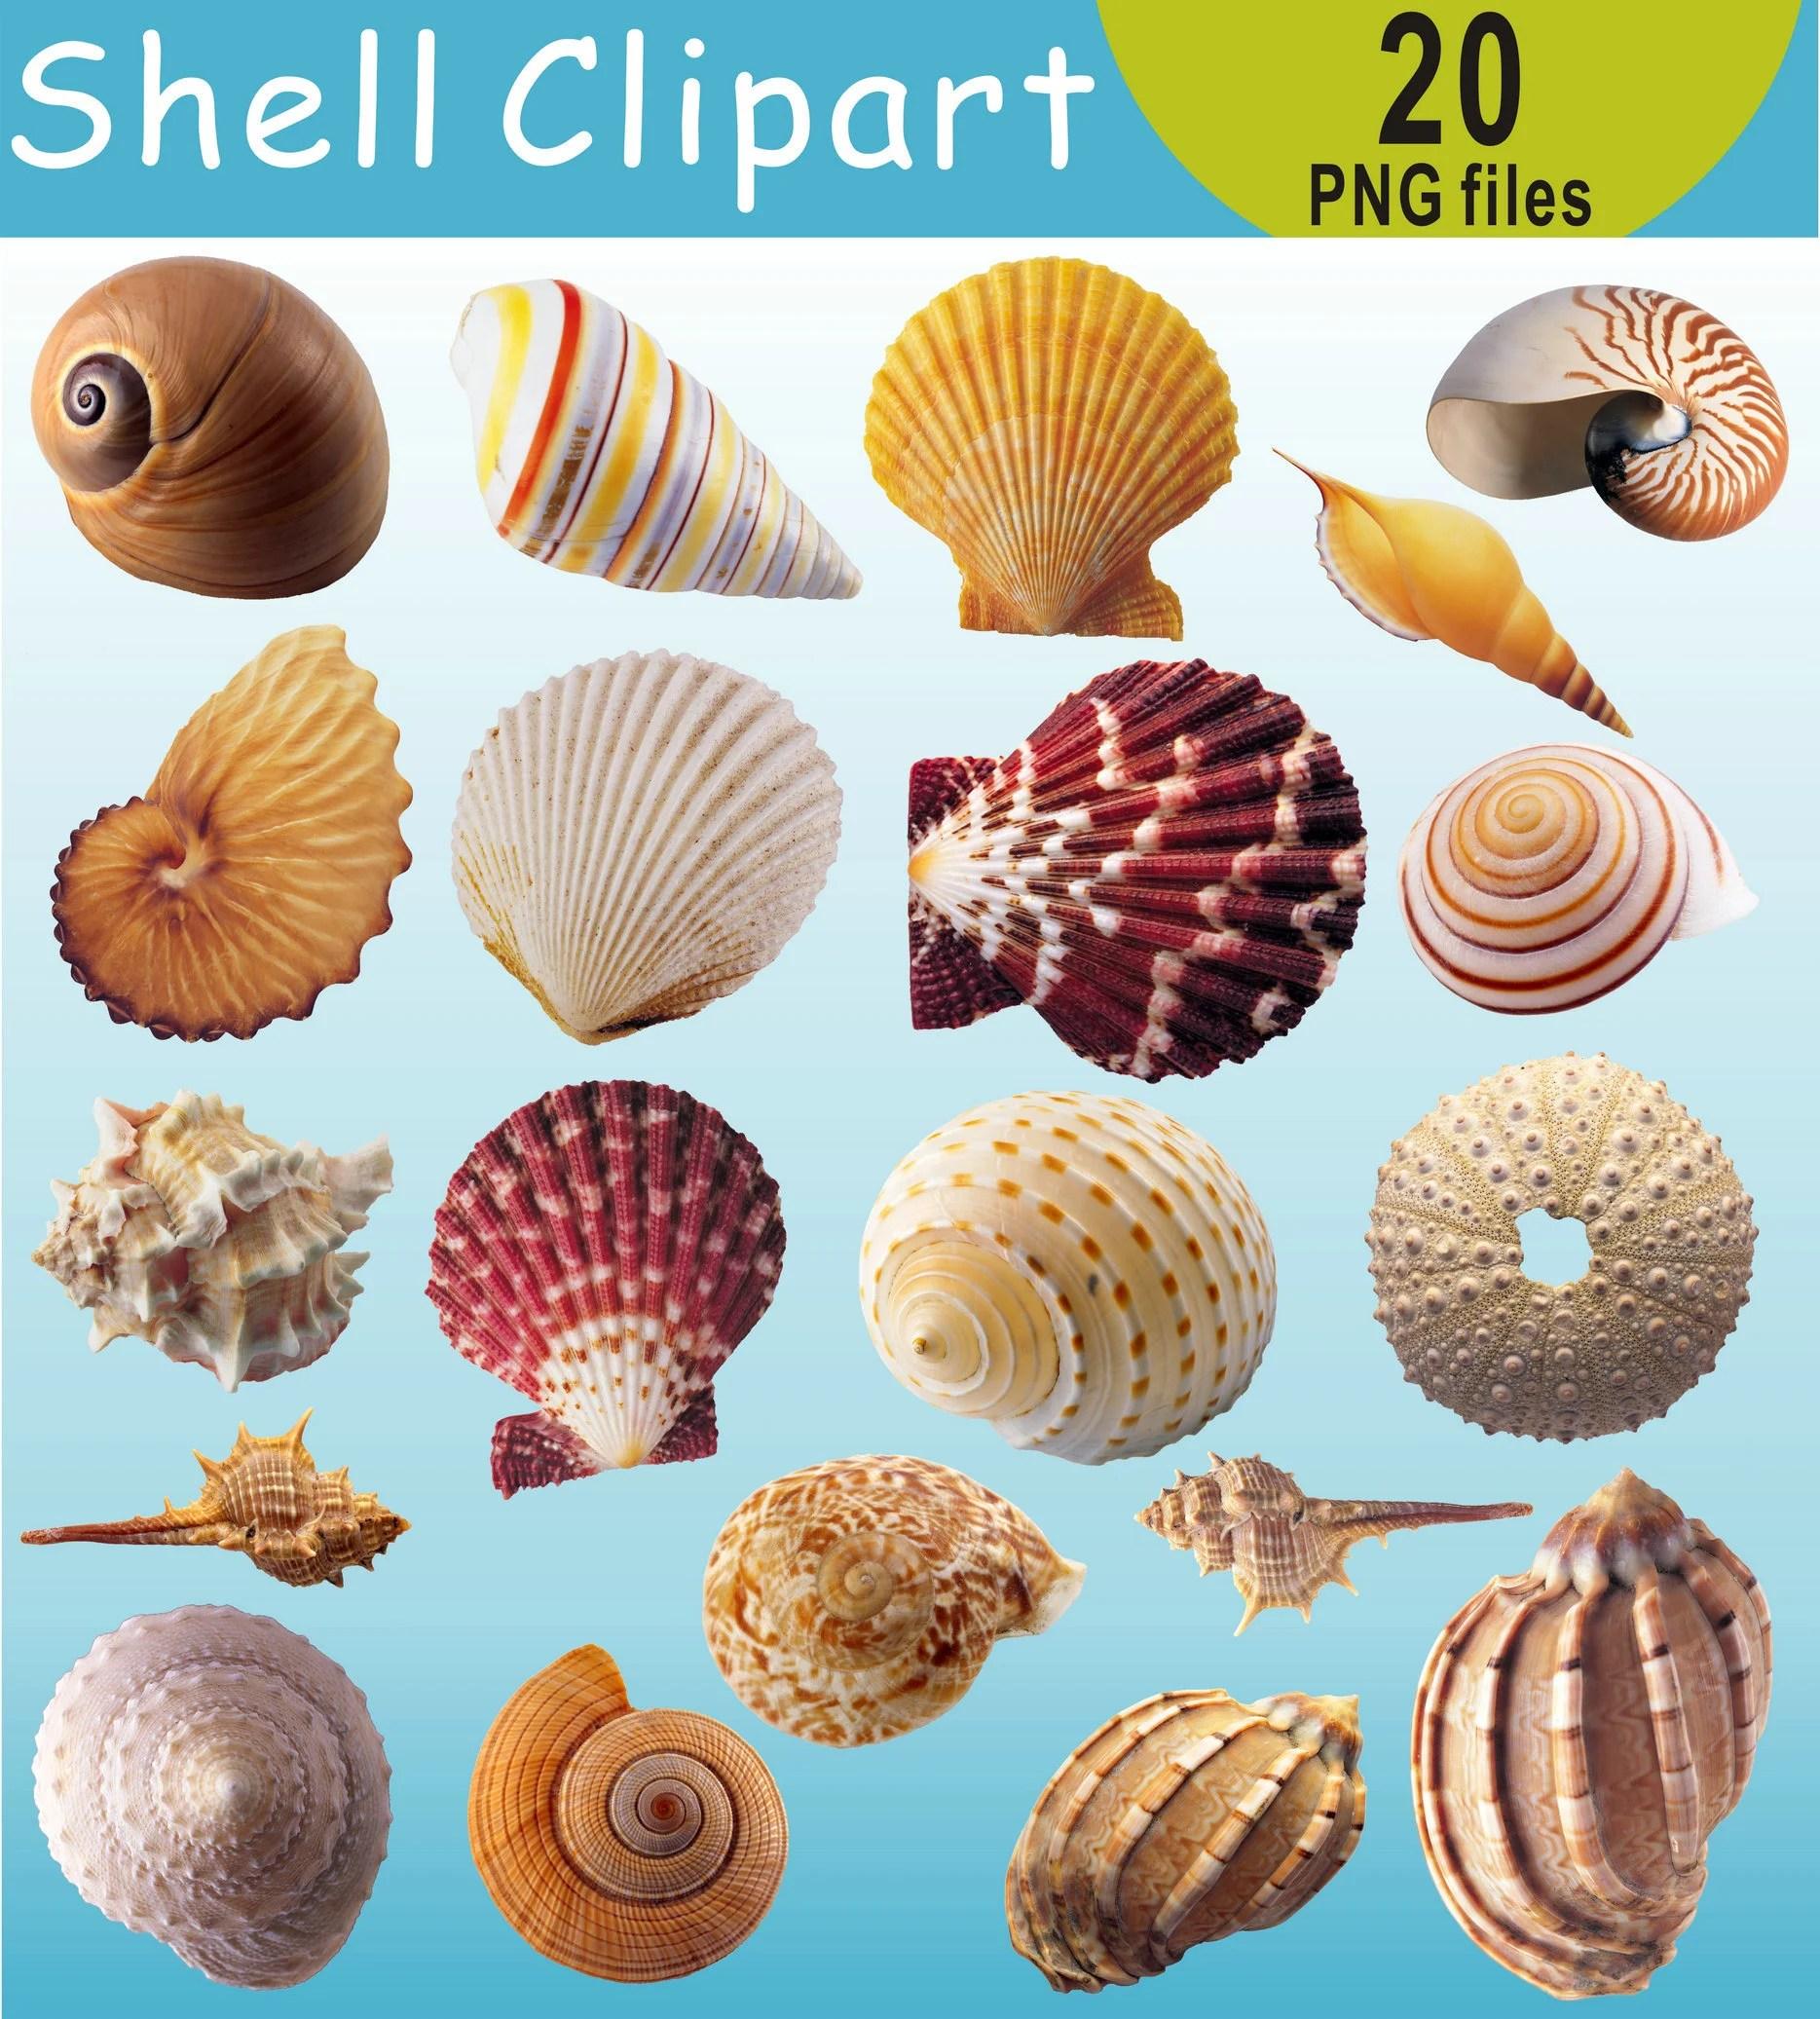 Seashell Clipart Shell Clip Art Under The Sea Shells